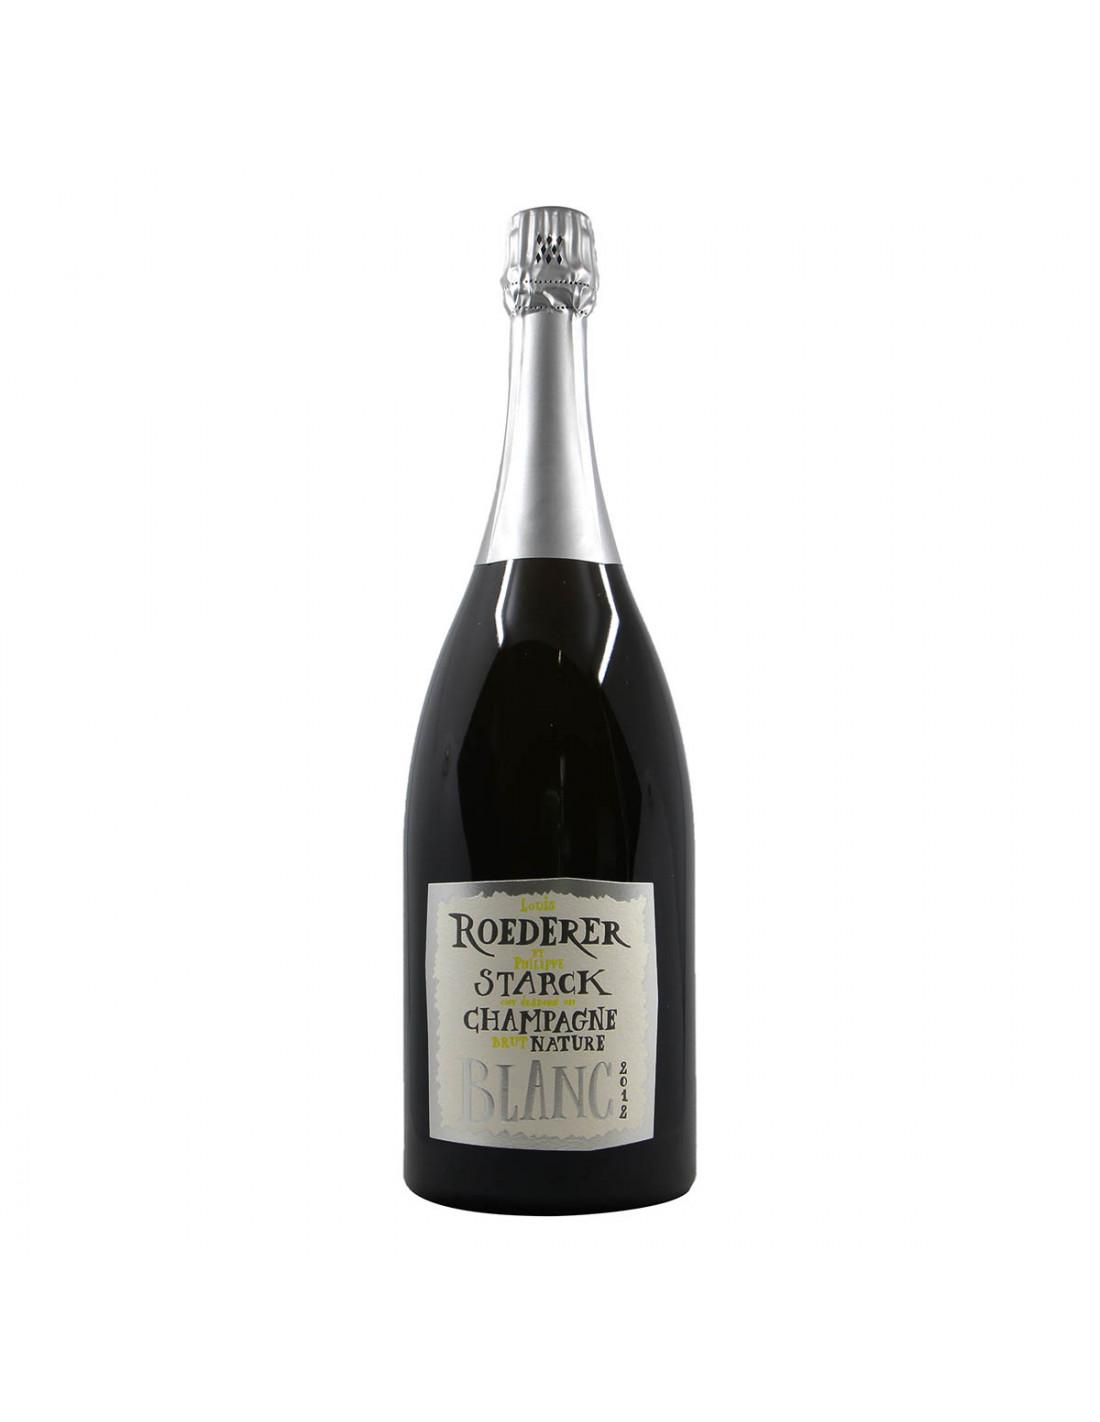 Roederer Champagne Philippe Starck 2012 Magnum Grandi Bottiglie